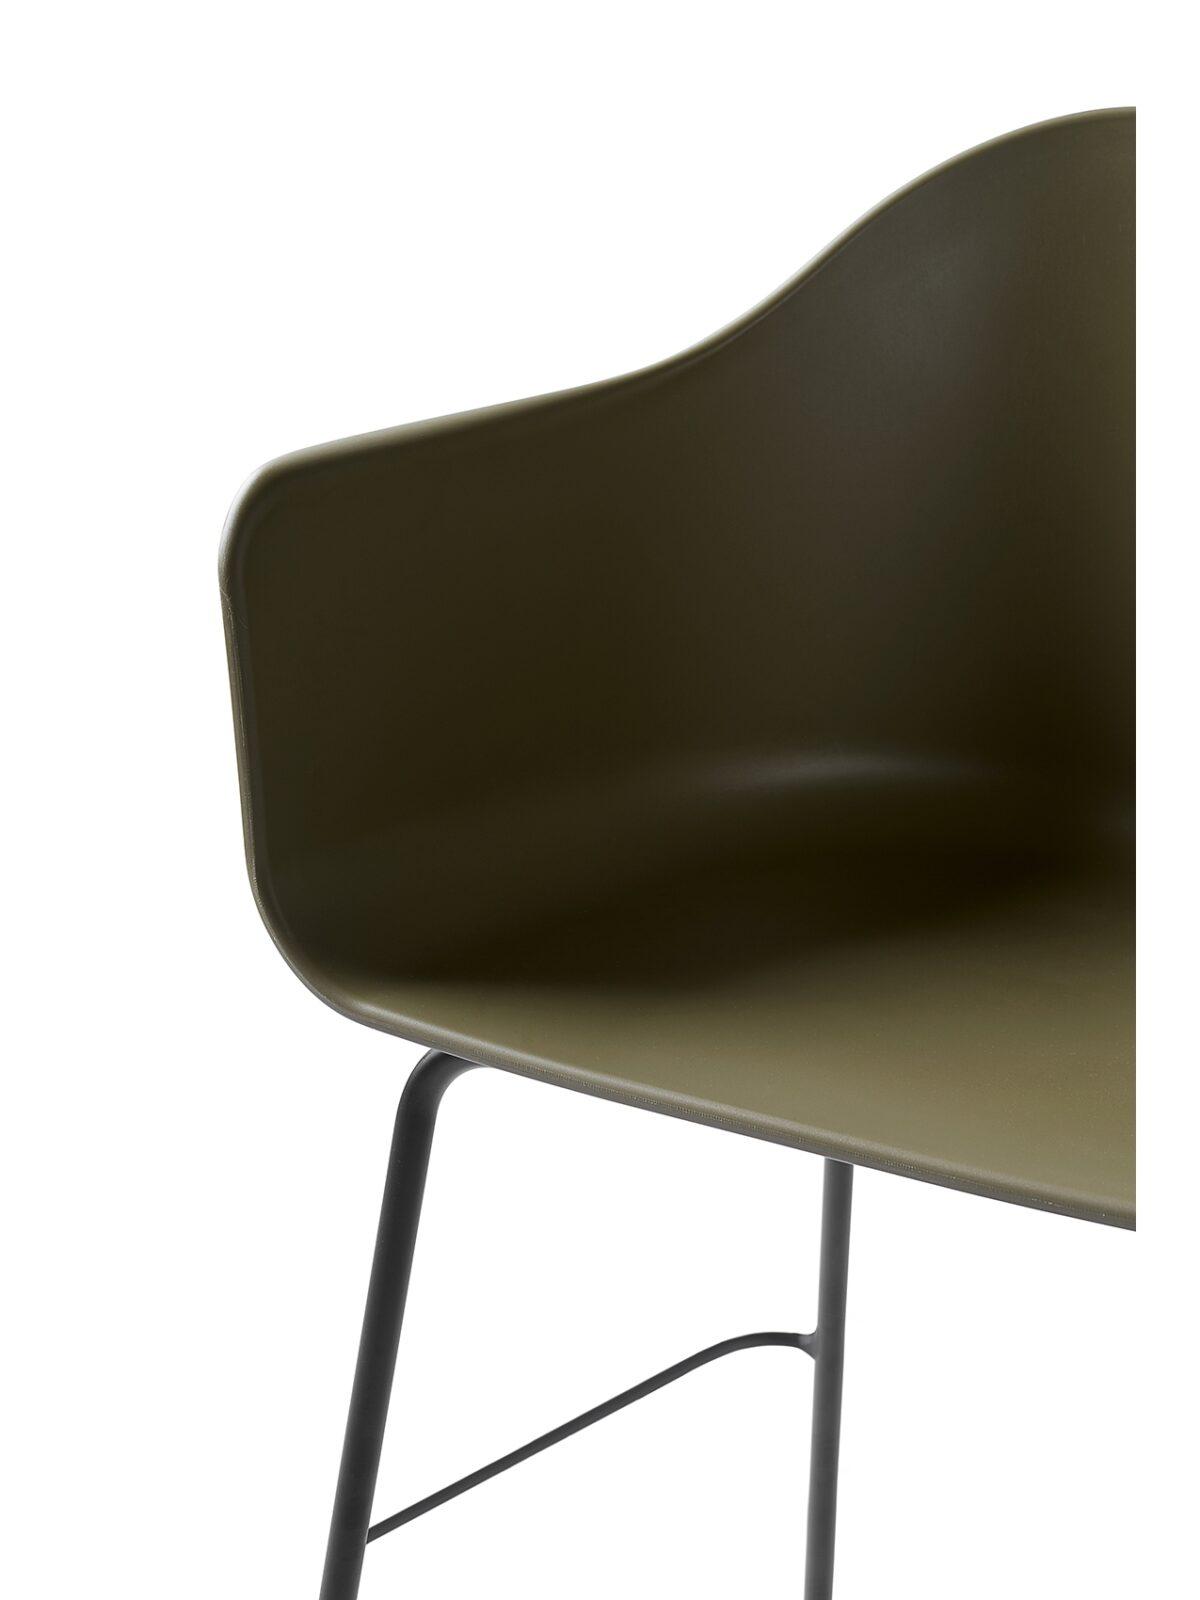 9345429 Harbour Chair bar Olive Black Detail